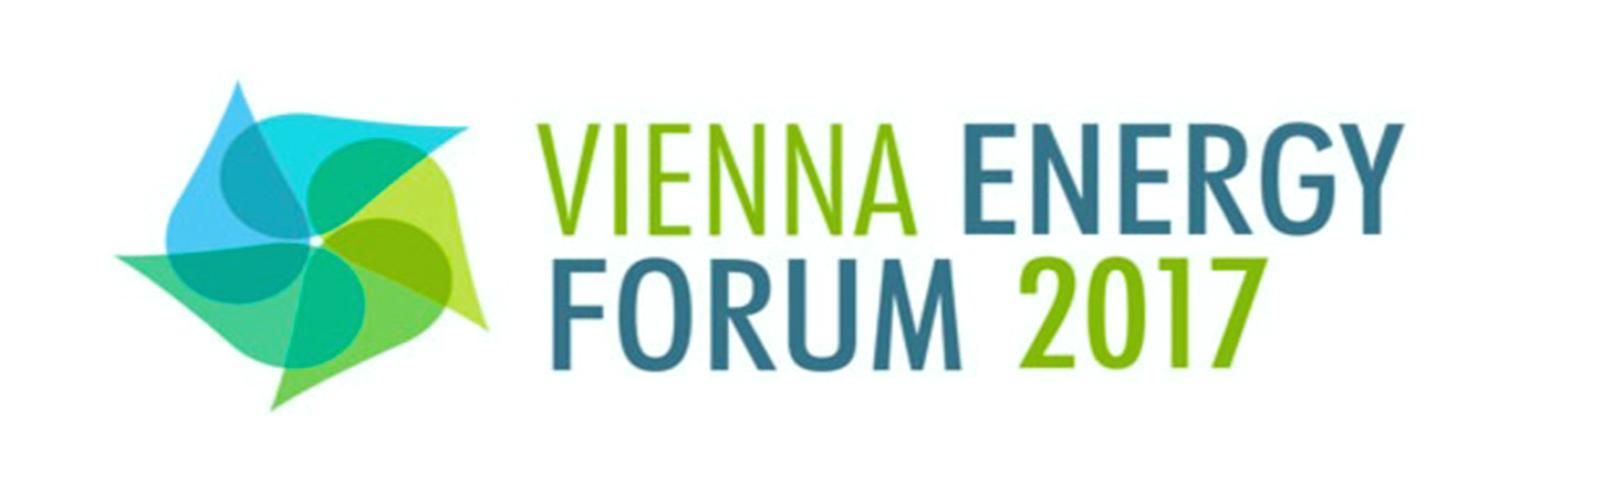 Vienna Energy Forum 2017 Logo